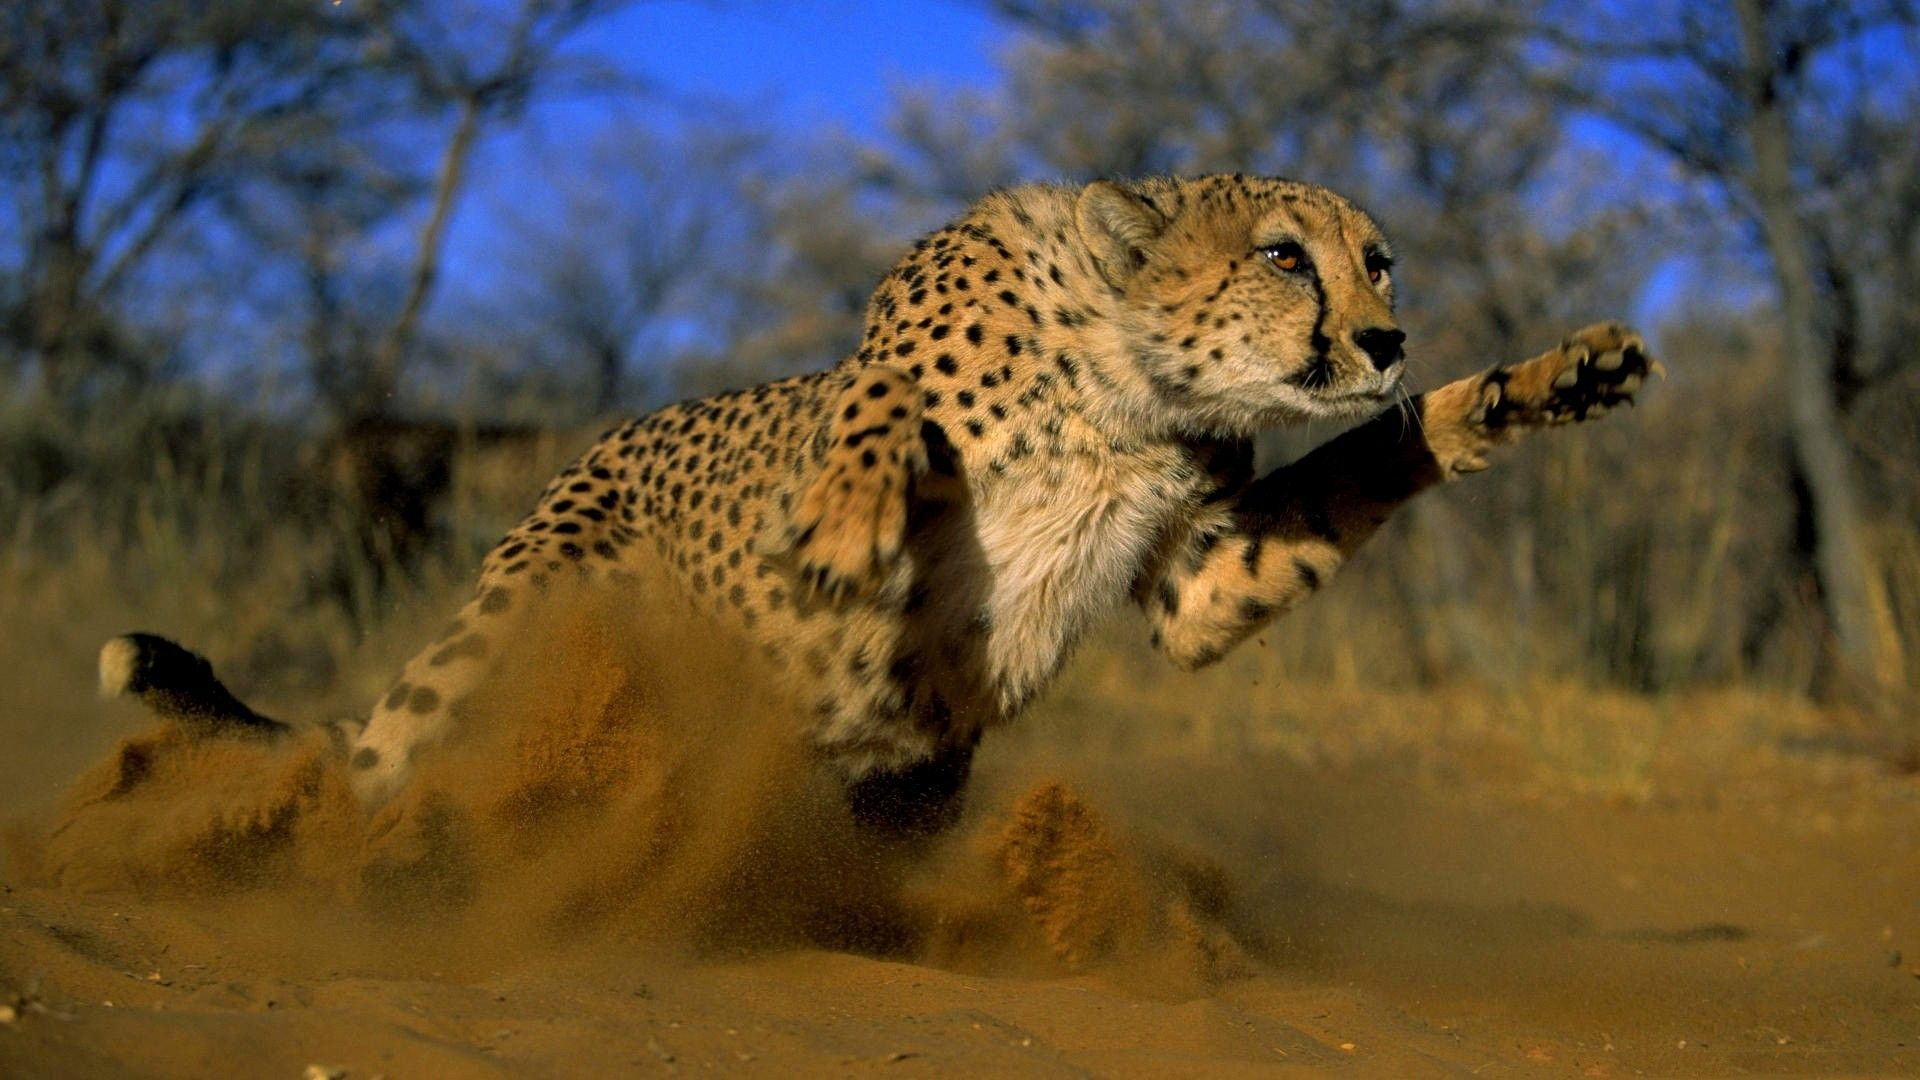 running Cheetah Running   HD Wallpapers Smashing HD Wallpapers 1920x1080